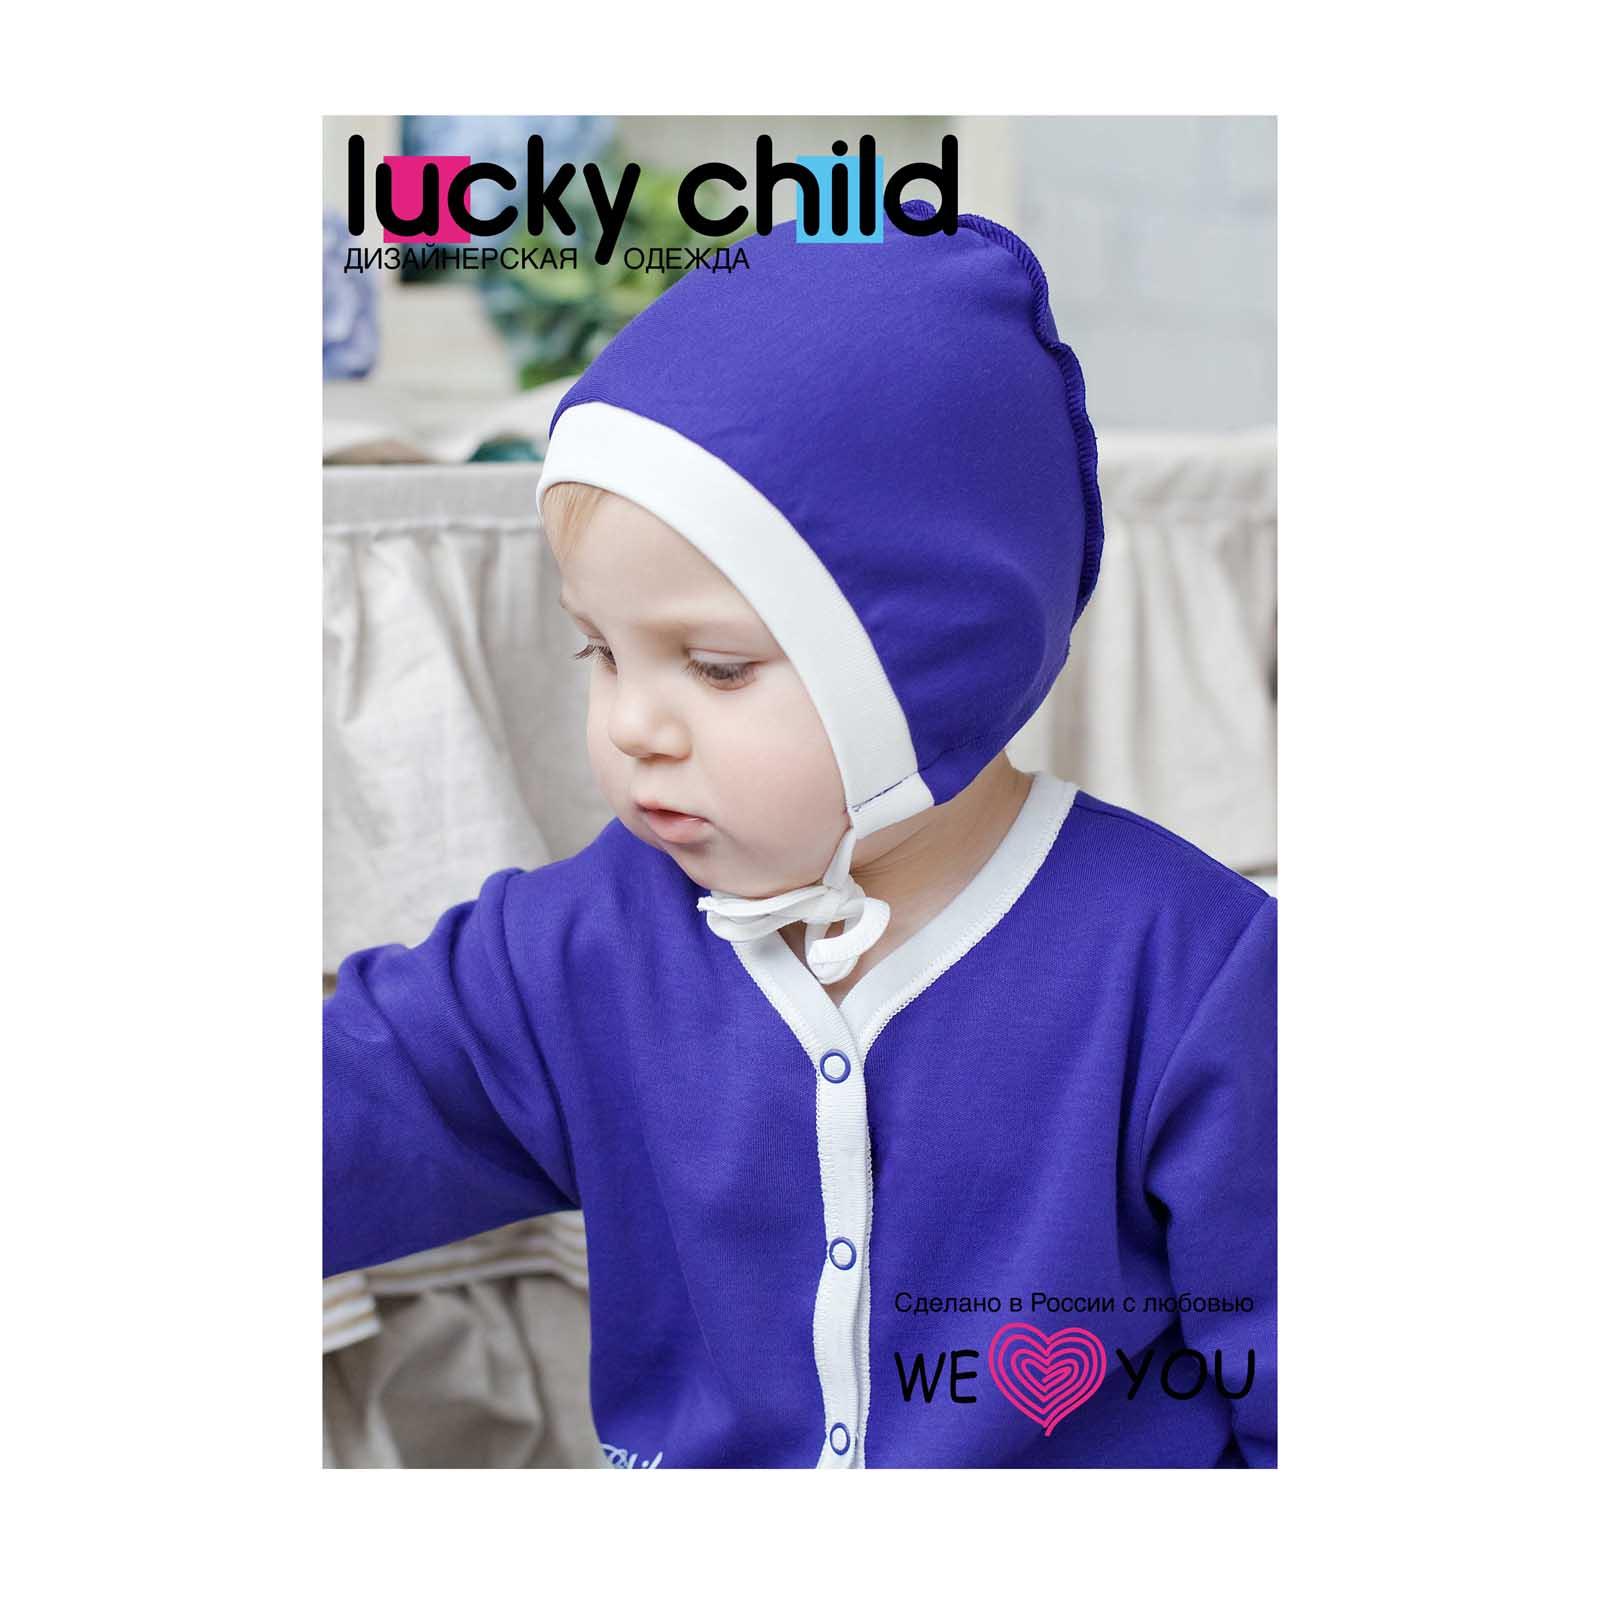 ������ Lucky Child, ��������� ��������, ���� ���������� � ����� ������� ������ 38